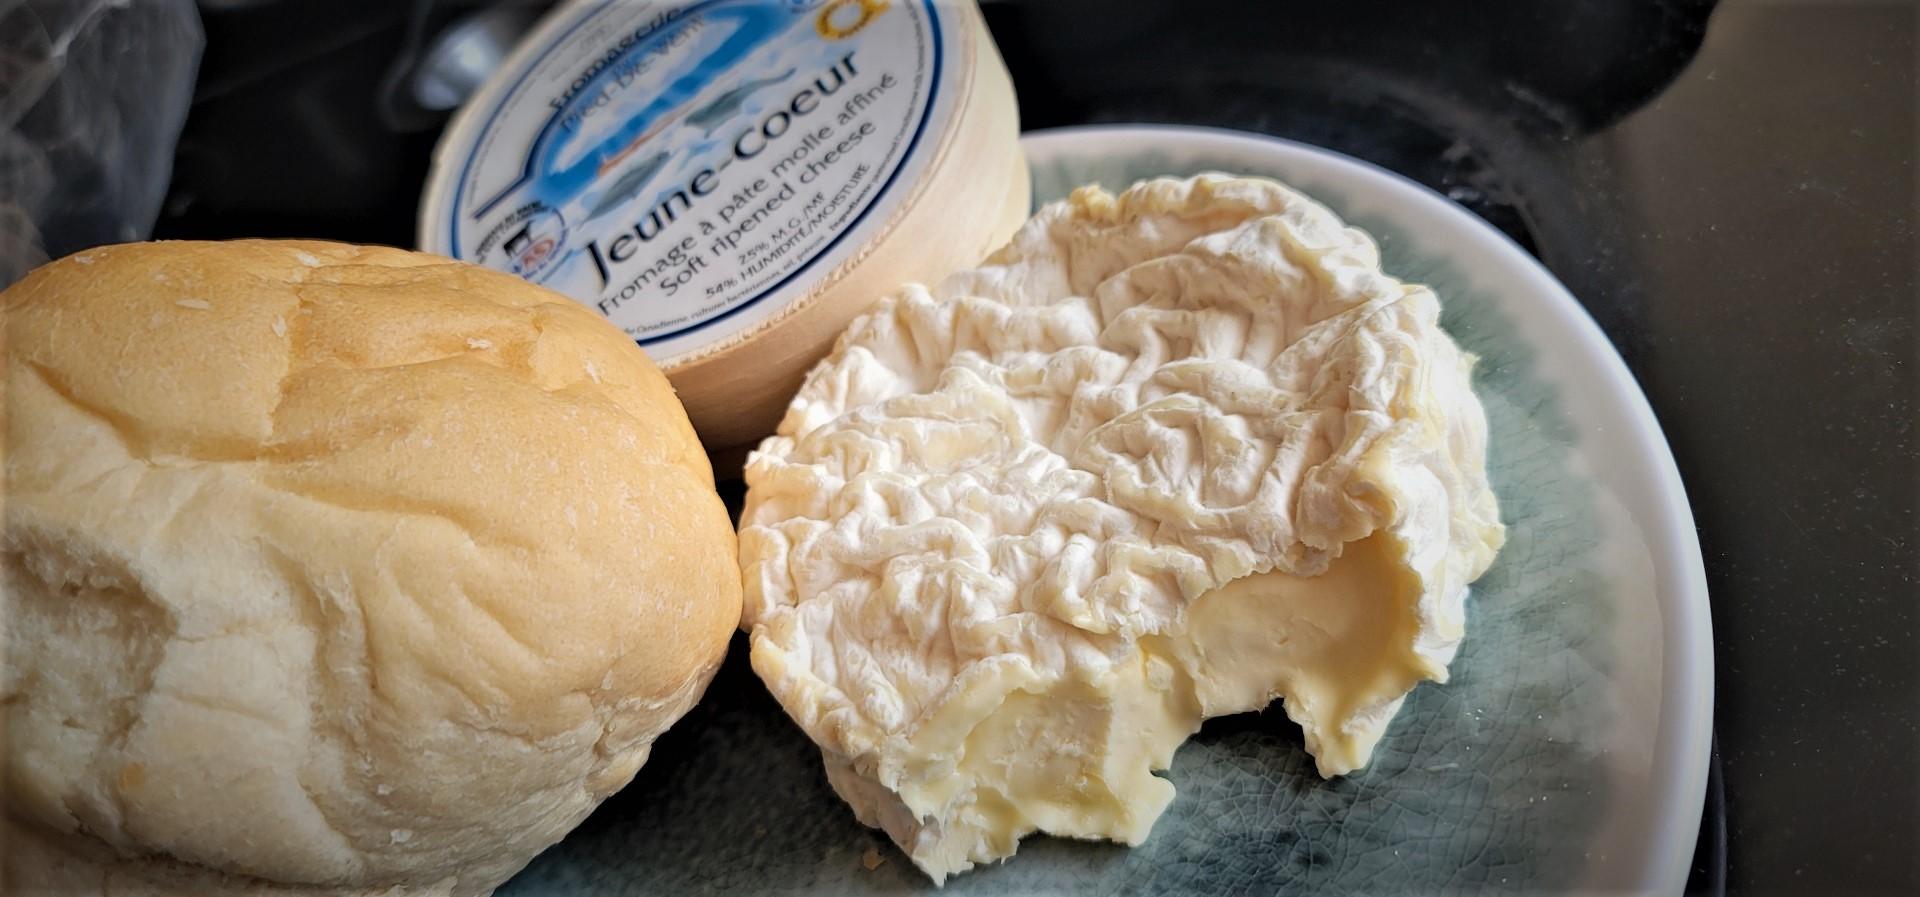 Jeune coeur cheese